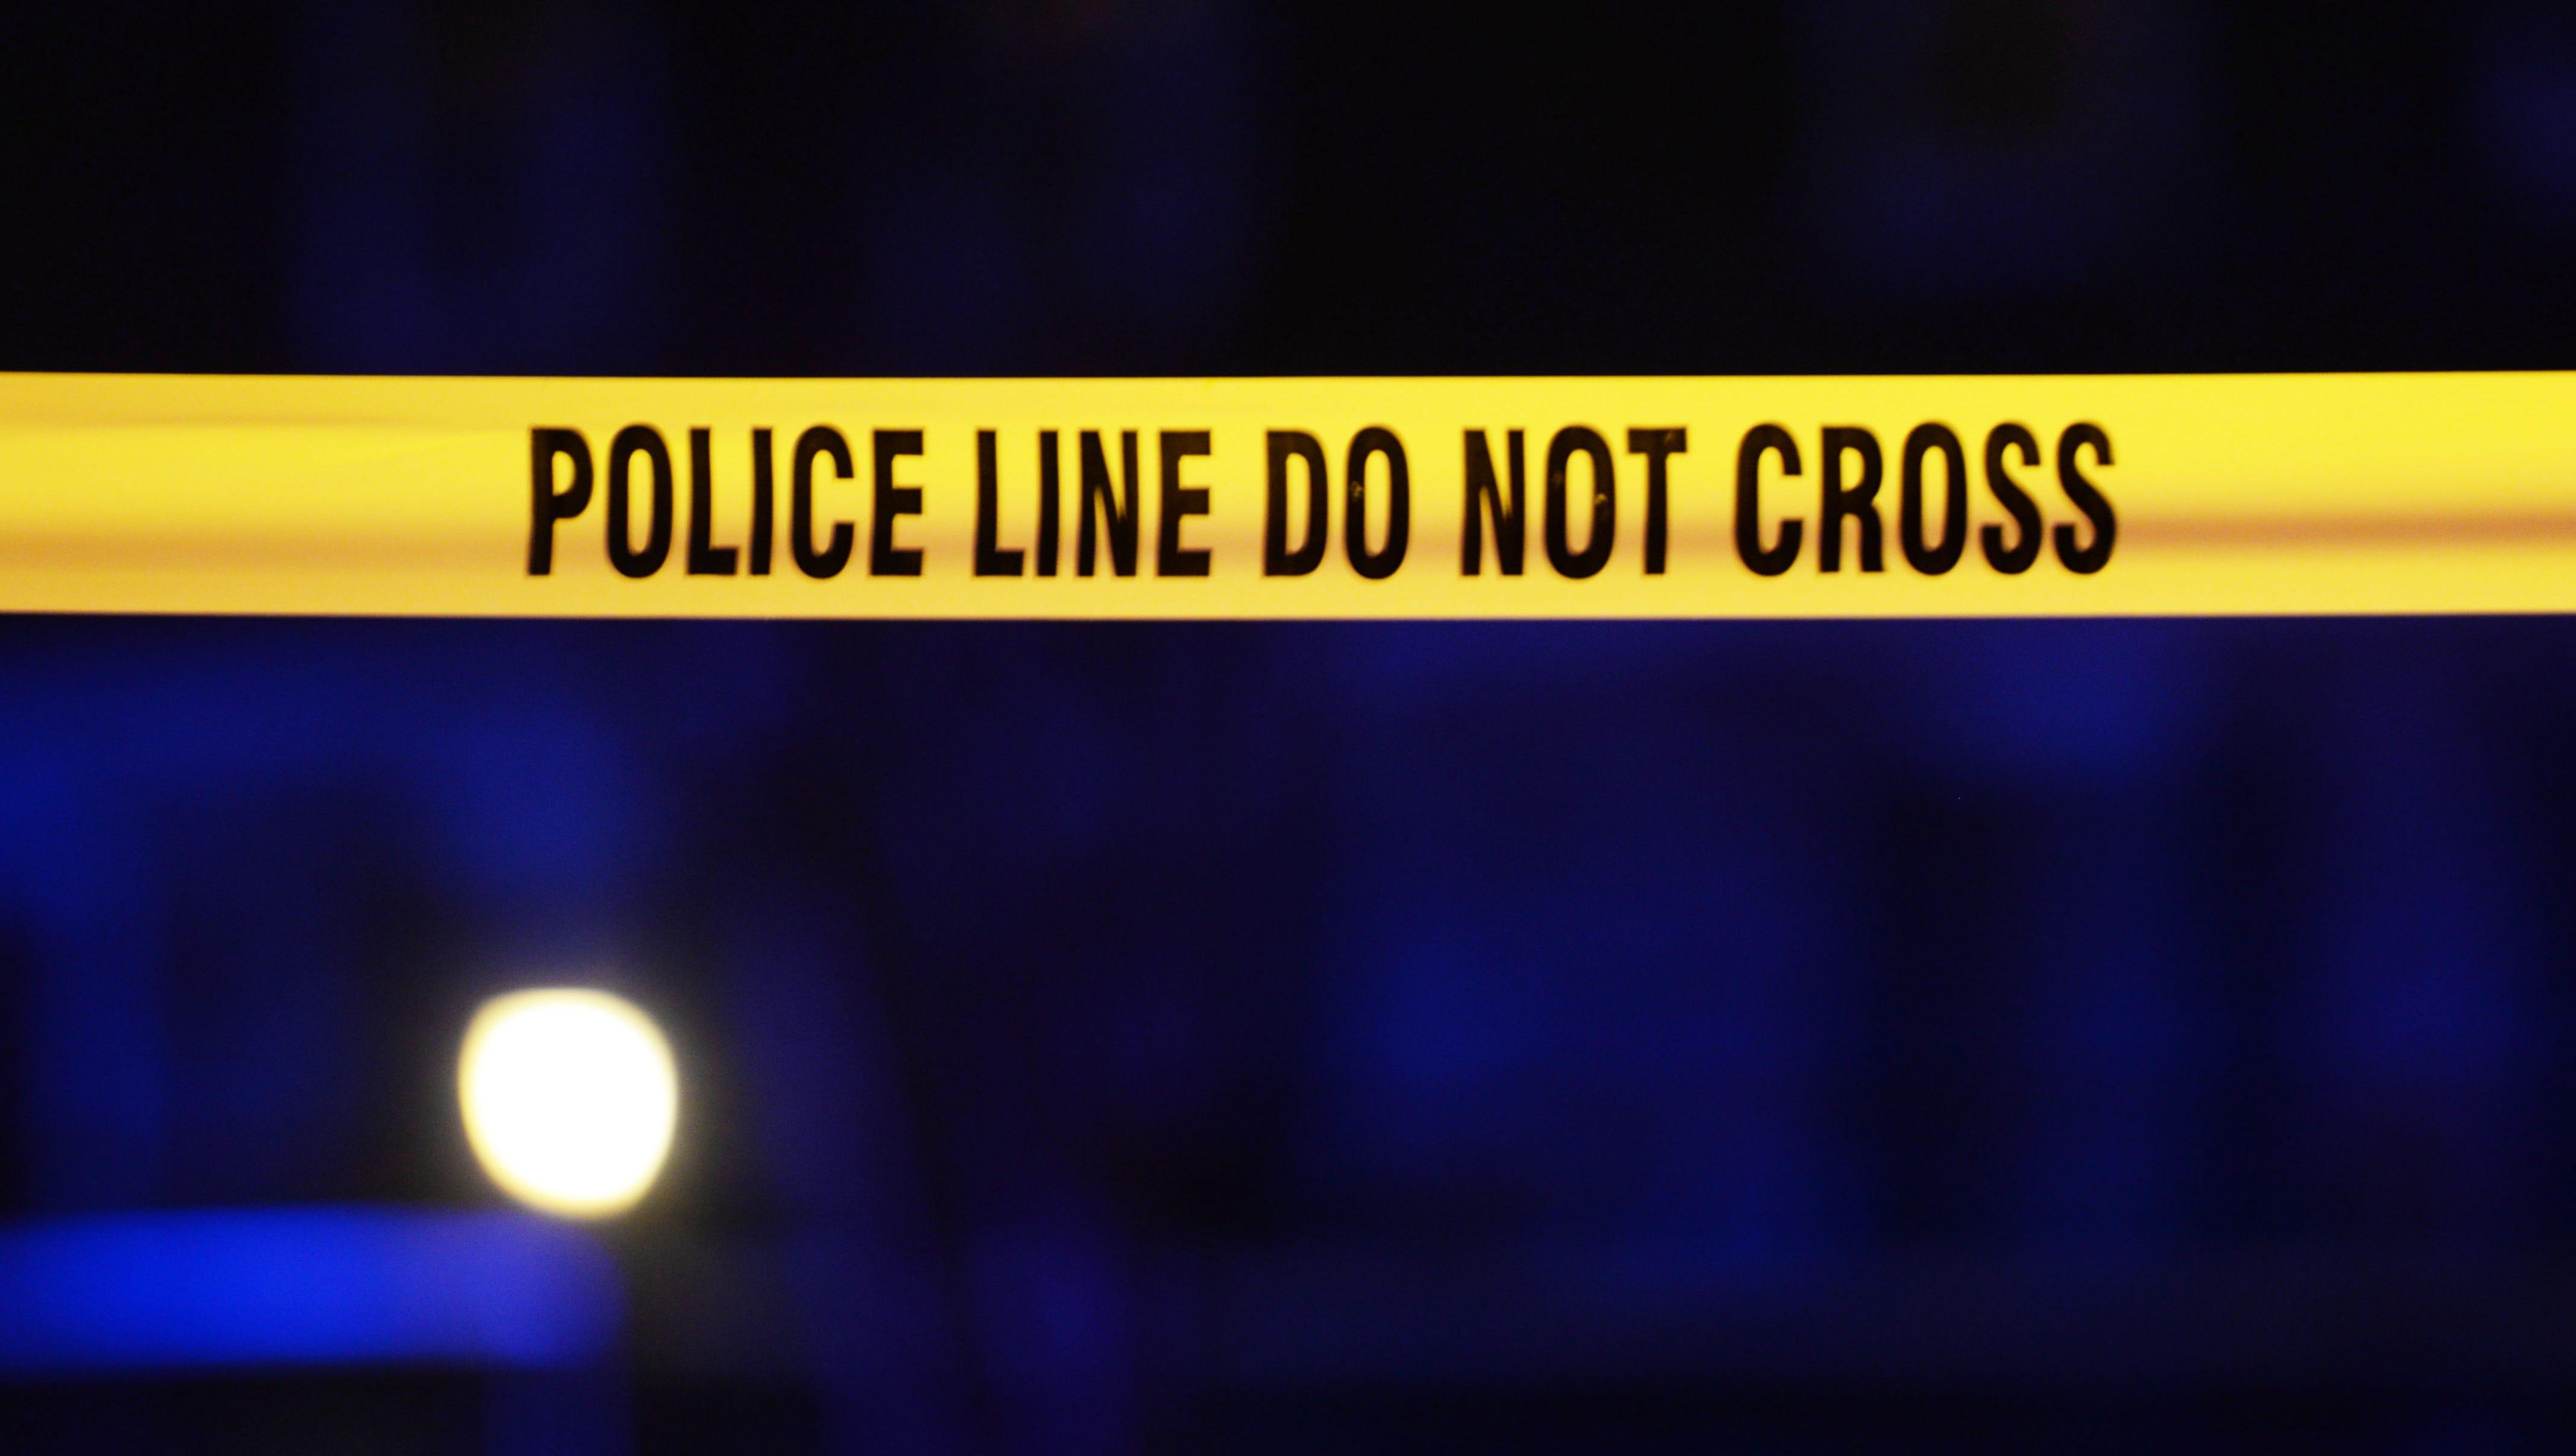 Grass-cutting crew finds body in Ascension Parish median